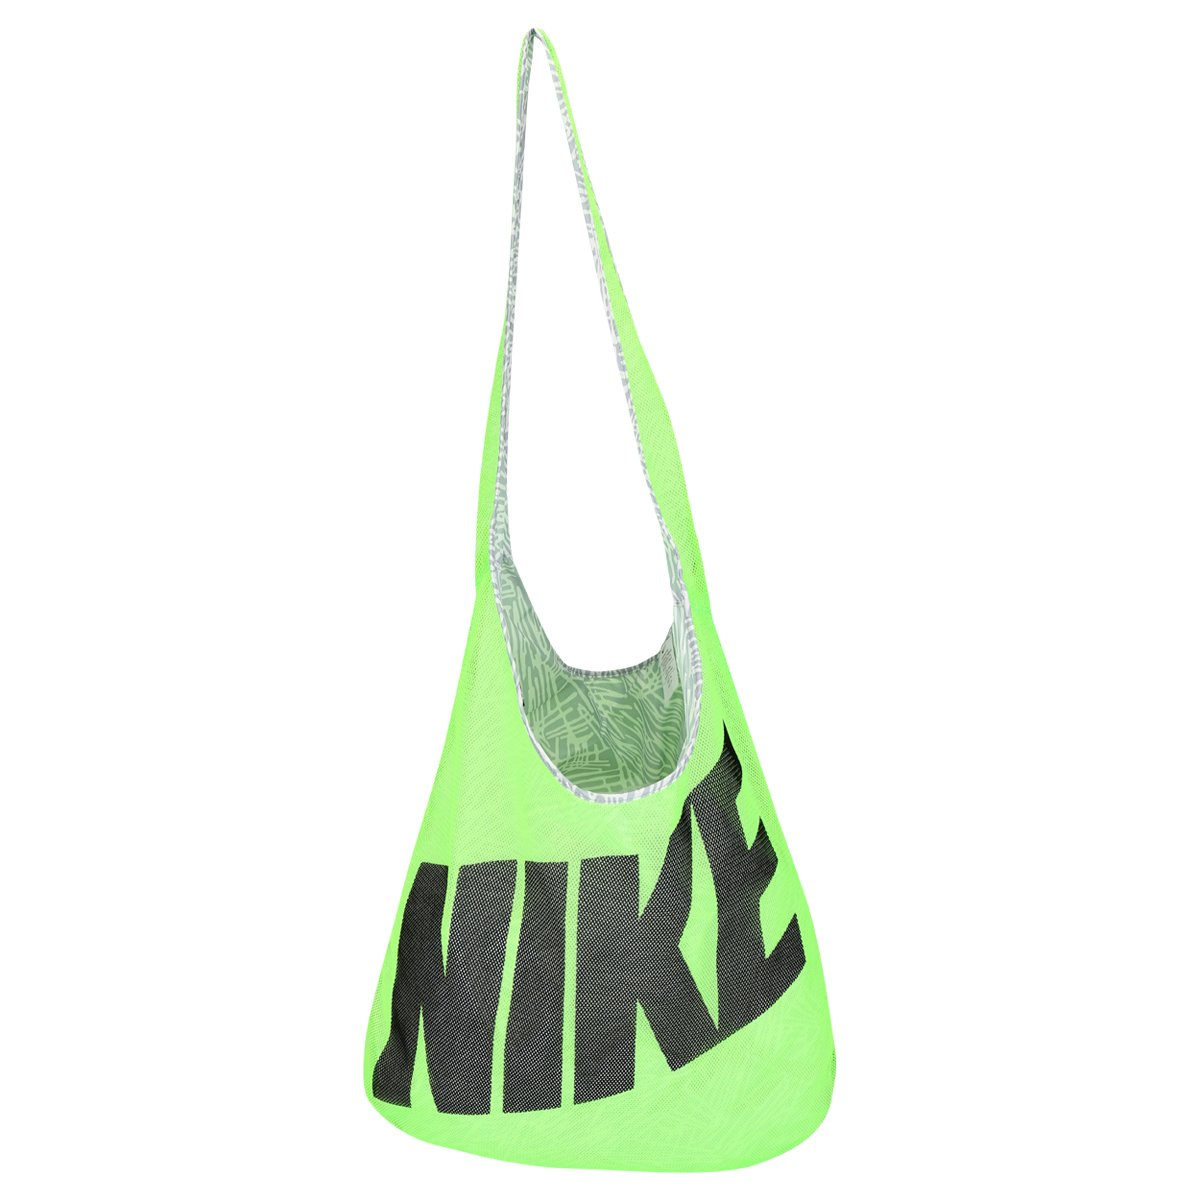 Agoranetshoes Bolsa Compre Graphic 5a4rjl Nike Feminina Reversible XZuPikO